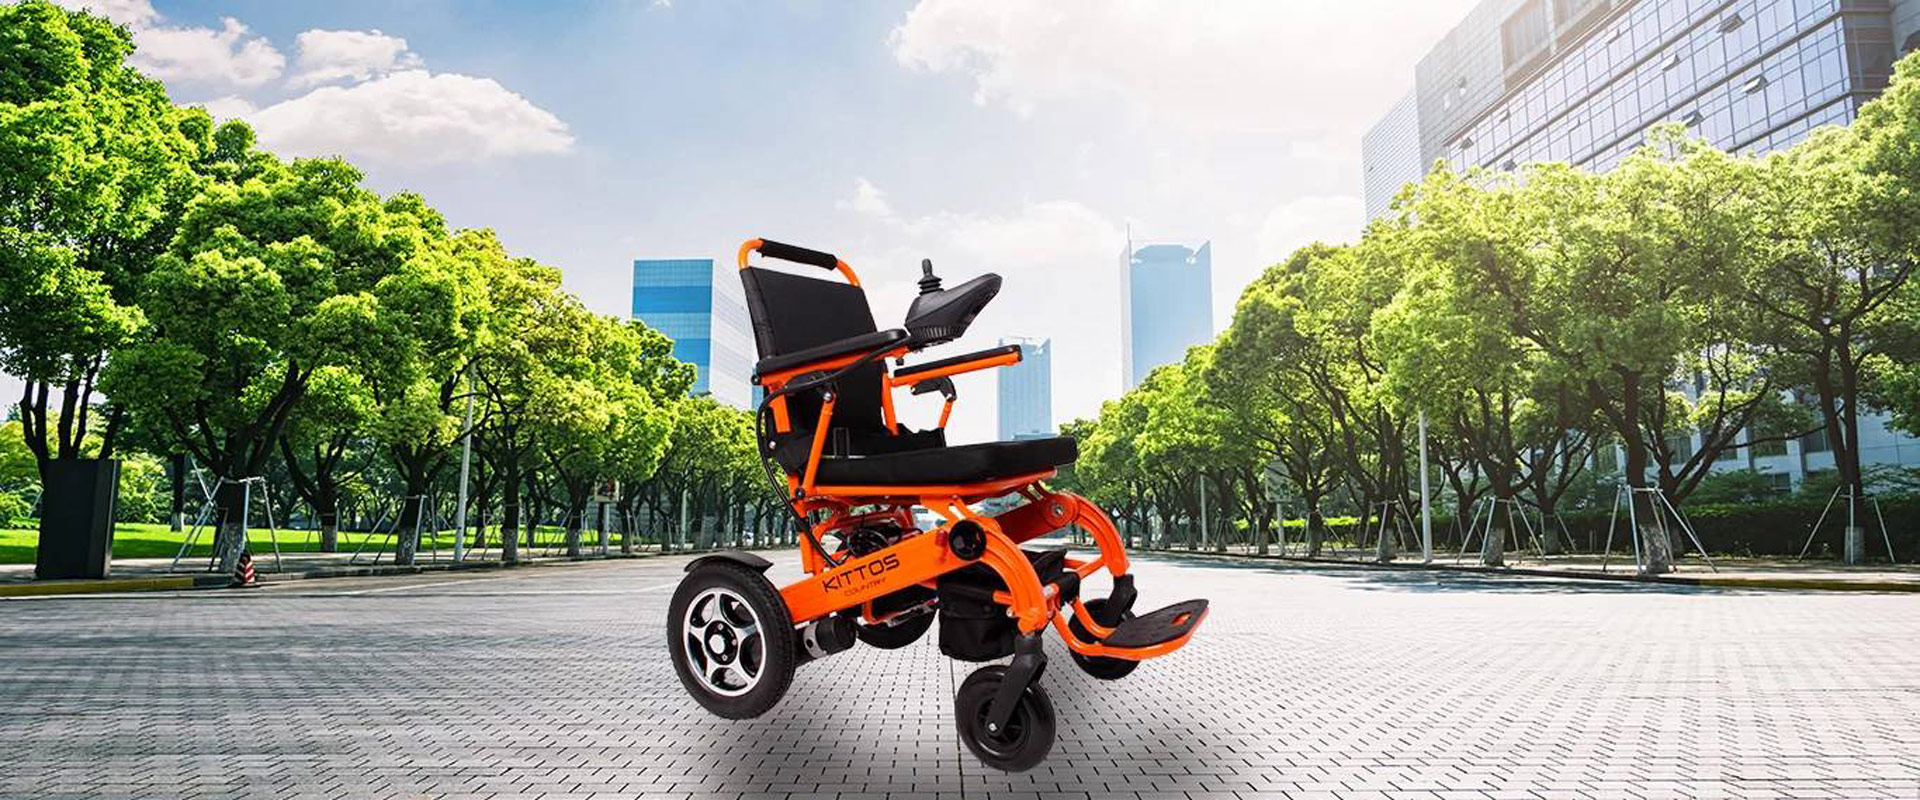 Silla de ruedas e kittos con plegado autom tico - Tamano silla de ruedas ...